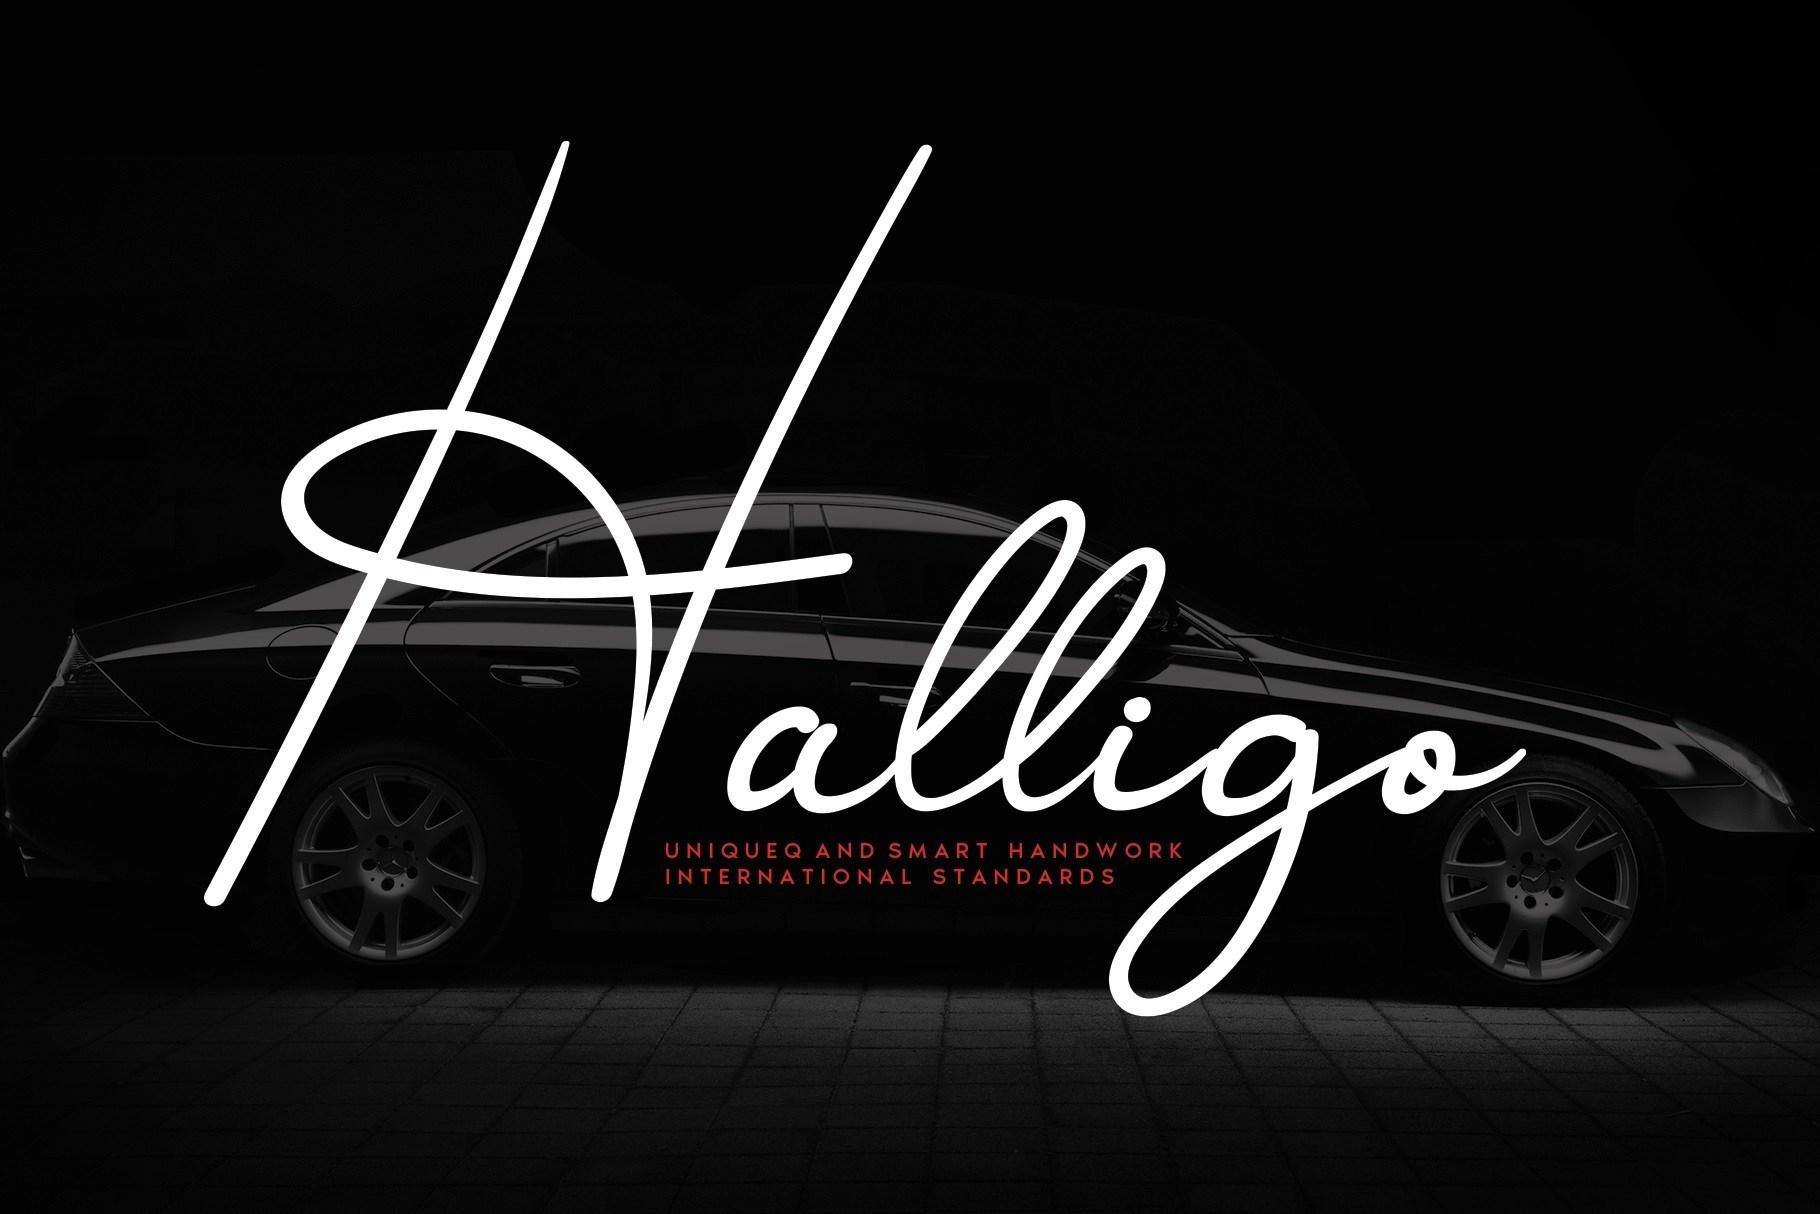 Halligo-Font